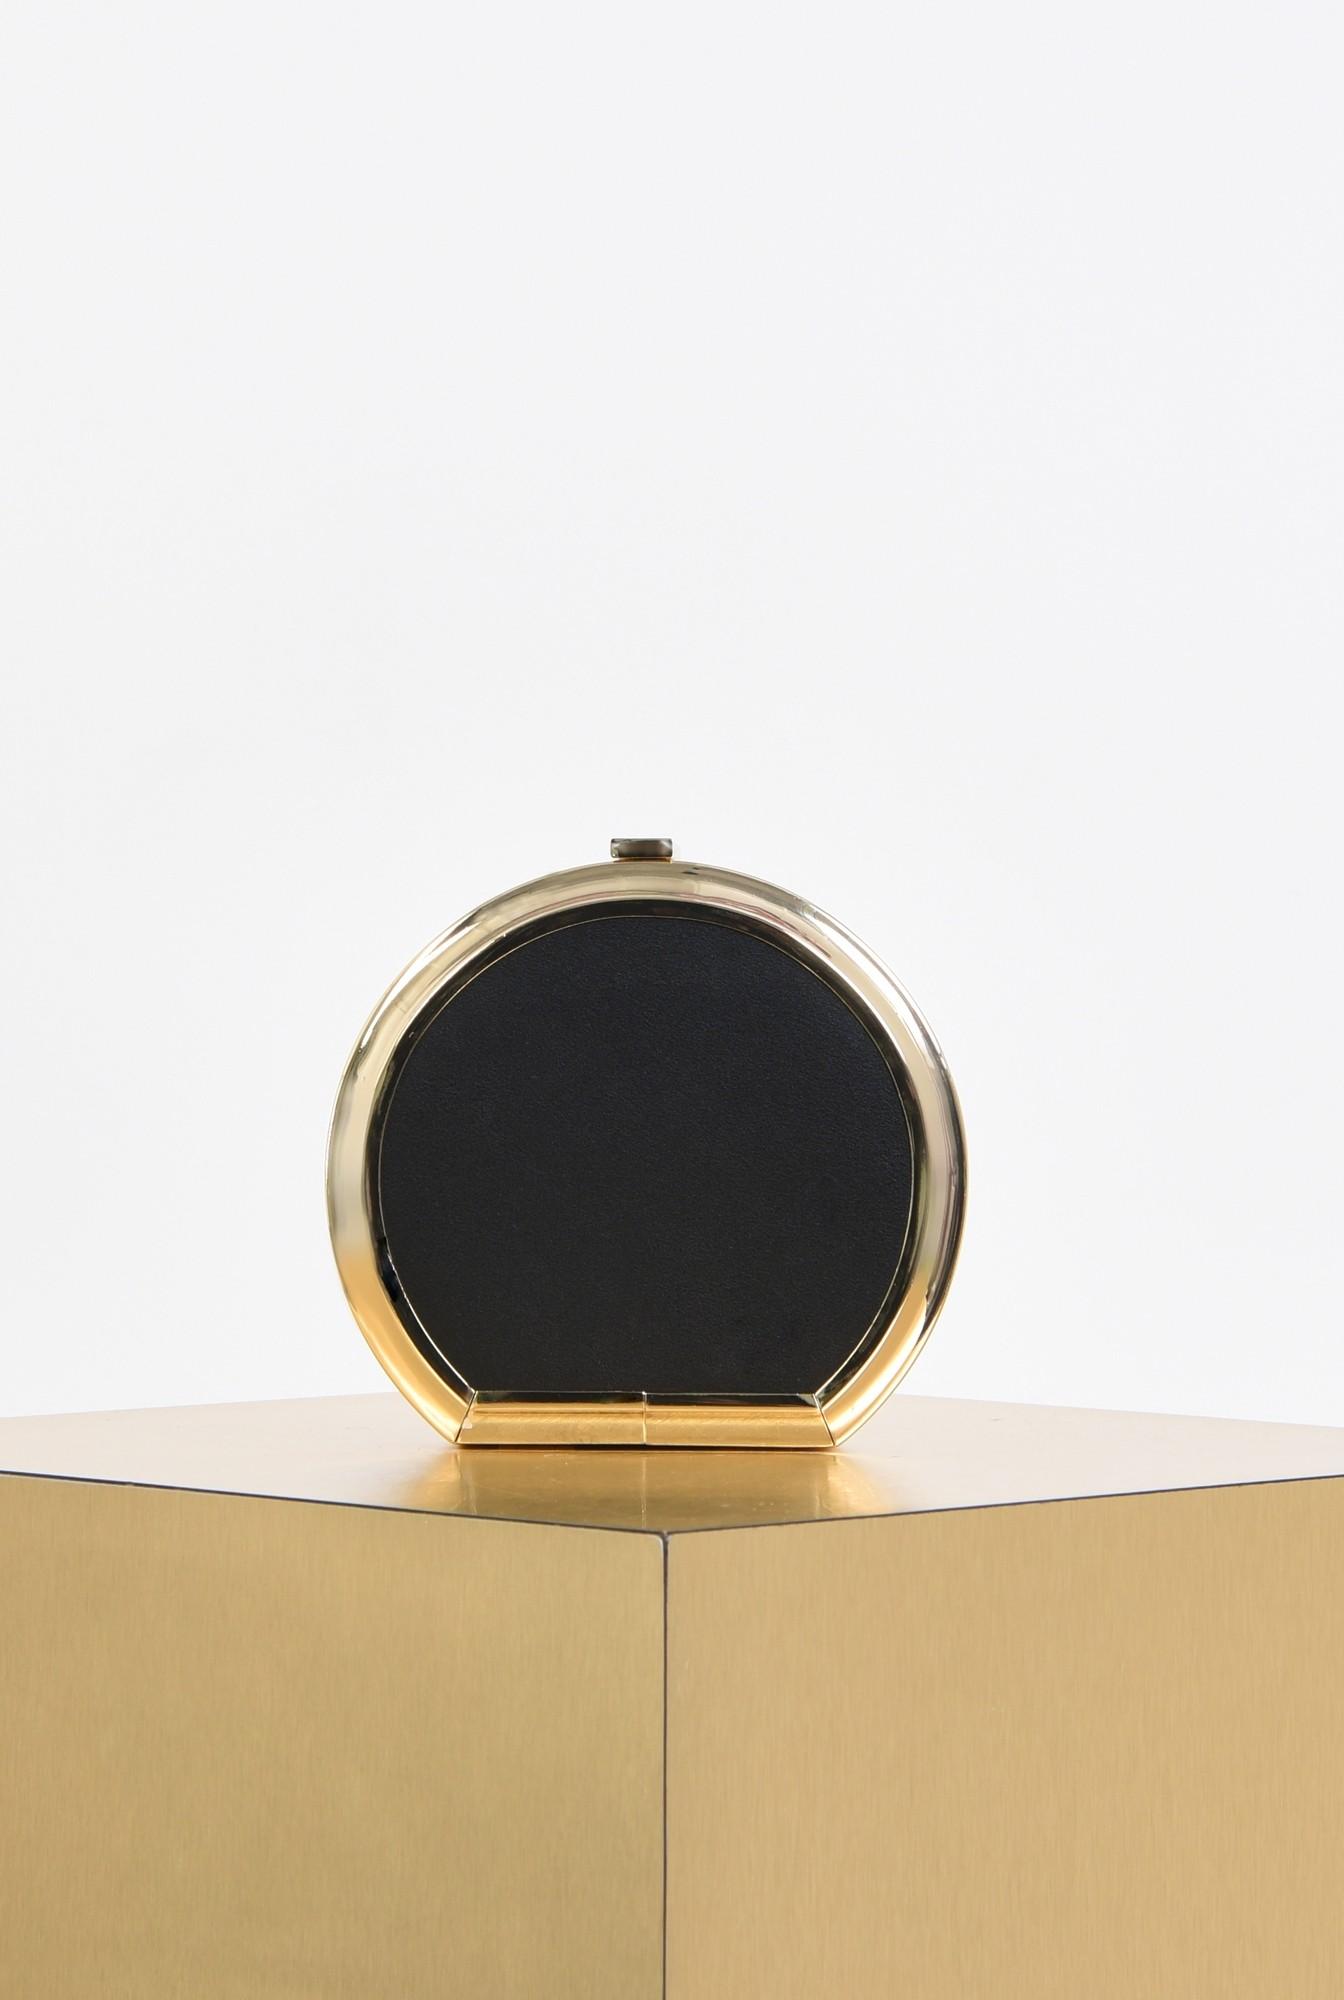 2 - plic elegant, negru, caseta, ciucure, lant auriu